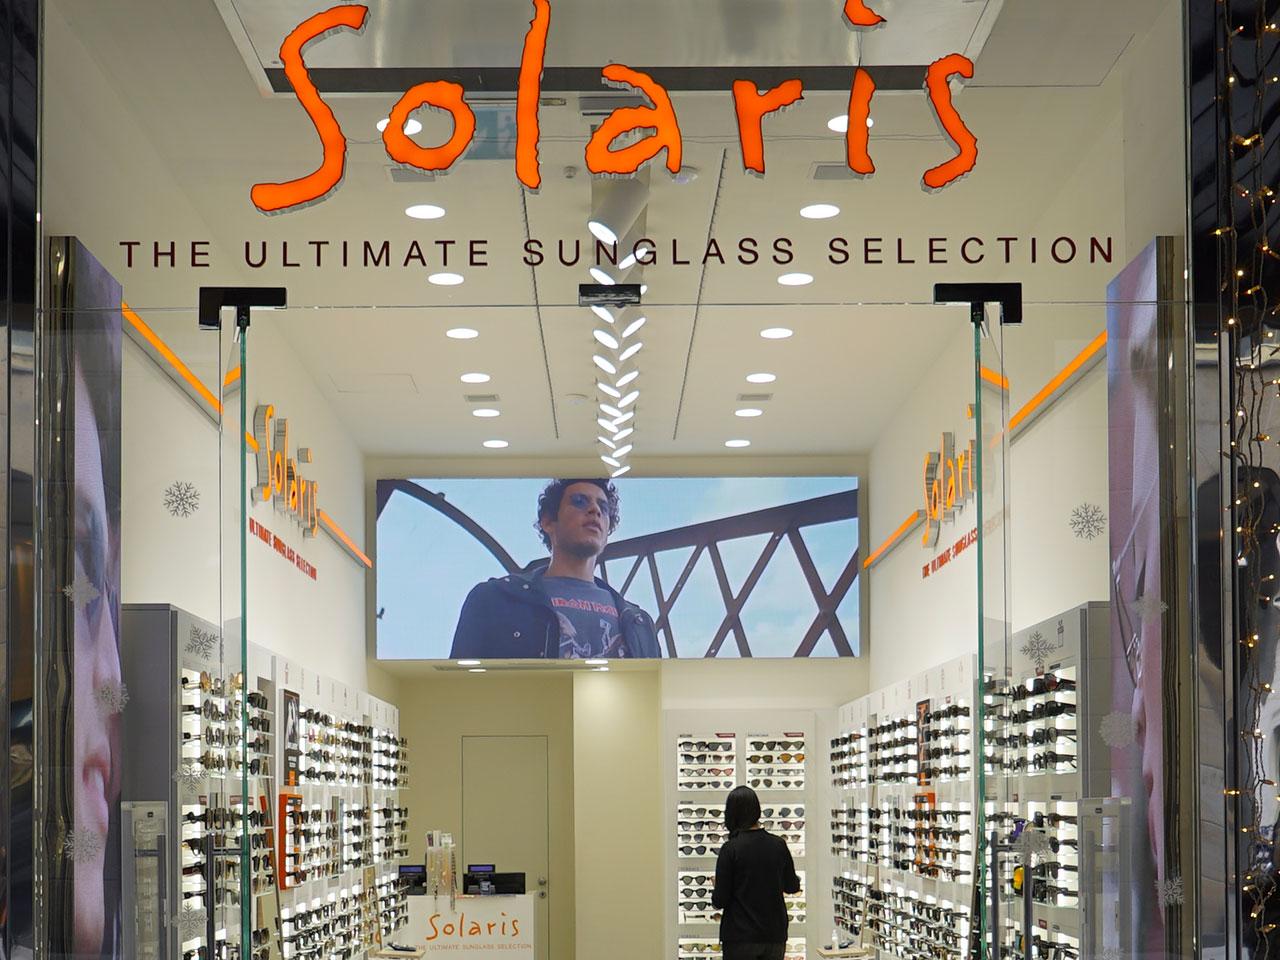 Solaris-ledwall-indoor-schermi-da-interni-fondo-store-retro-cassa-1280x960-5